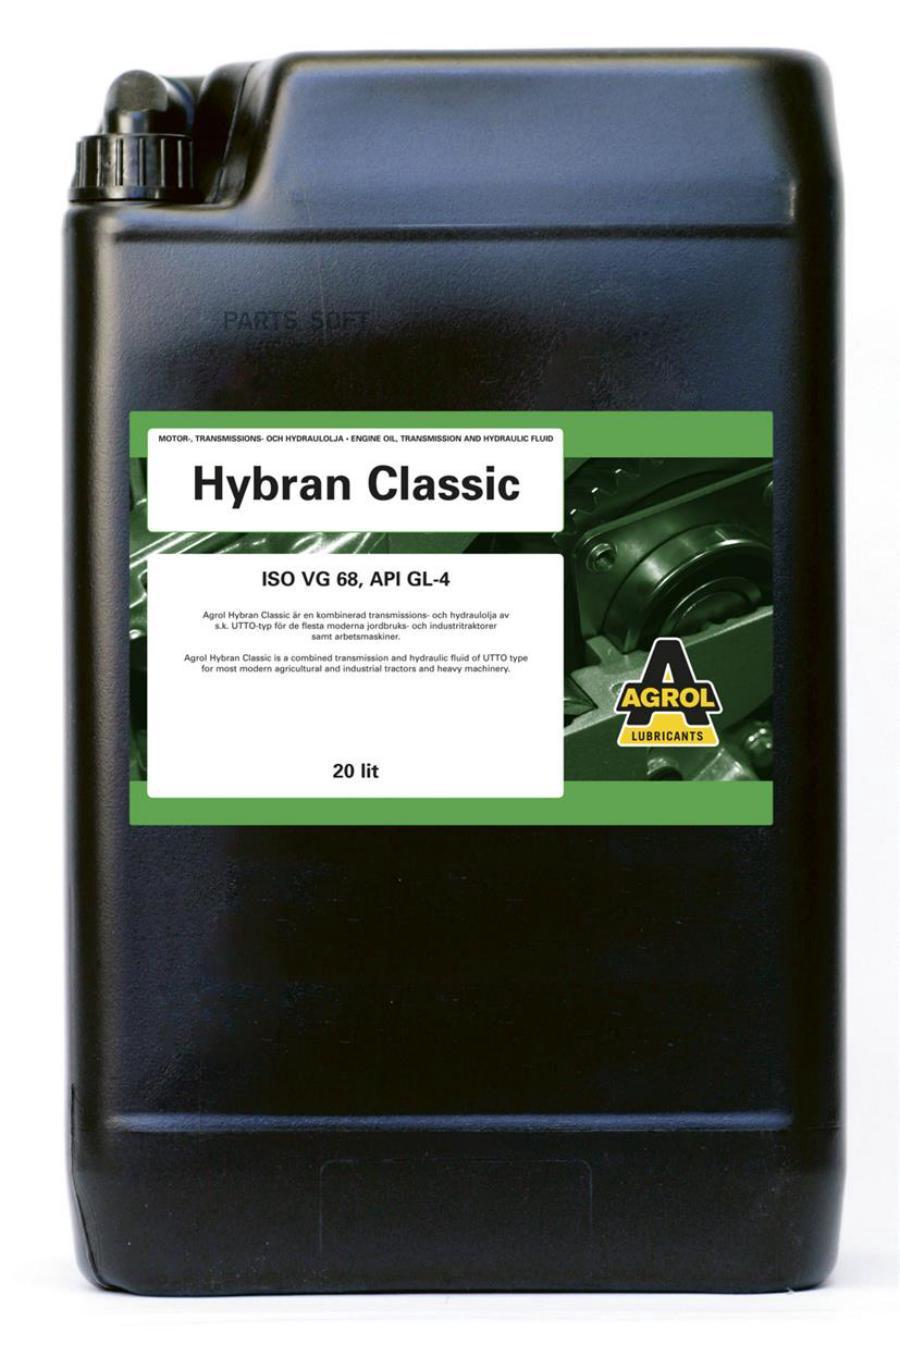 Hybran Classic